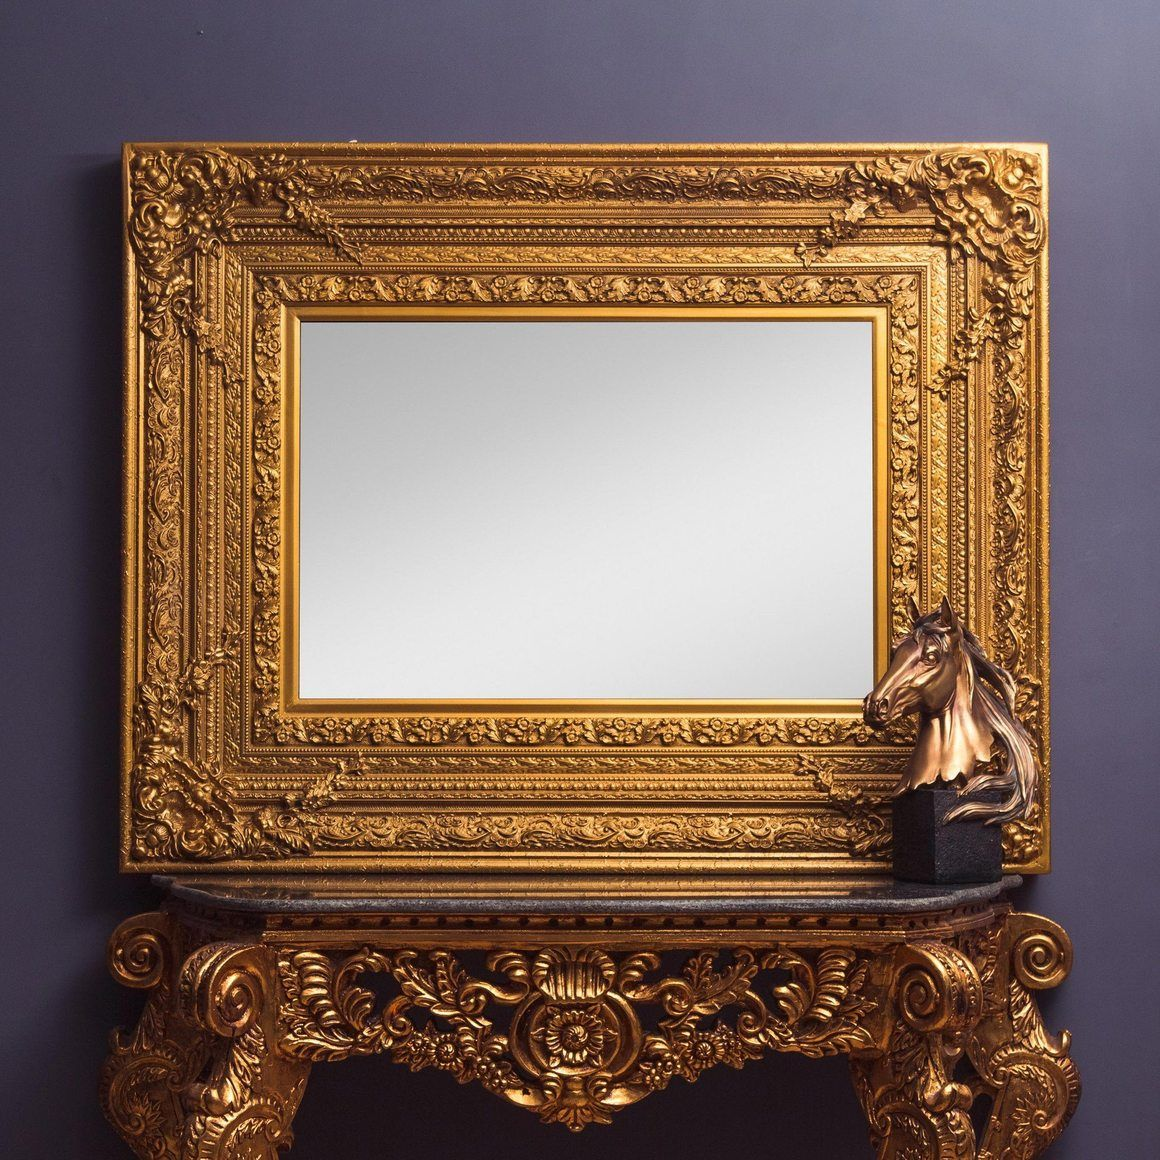 Wall Mirror Decor Buy Online Decorative Wall Mirror In India